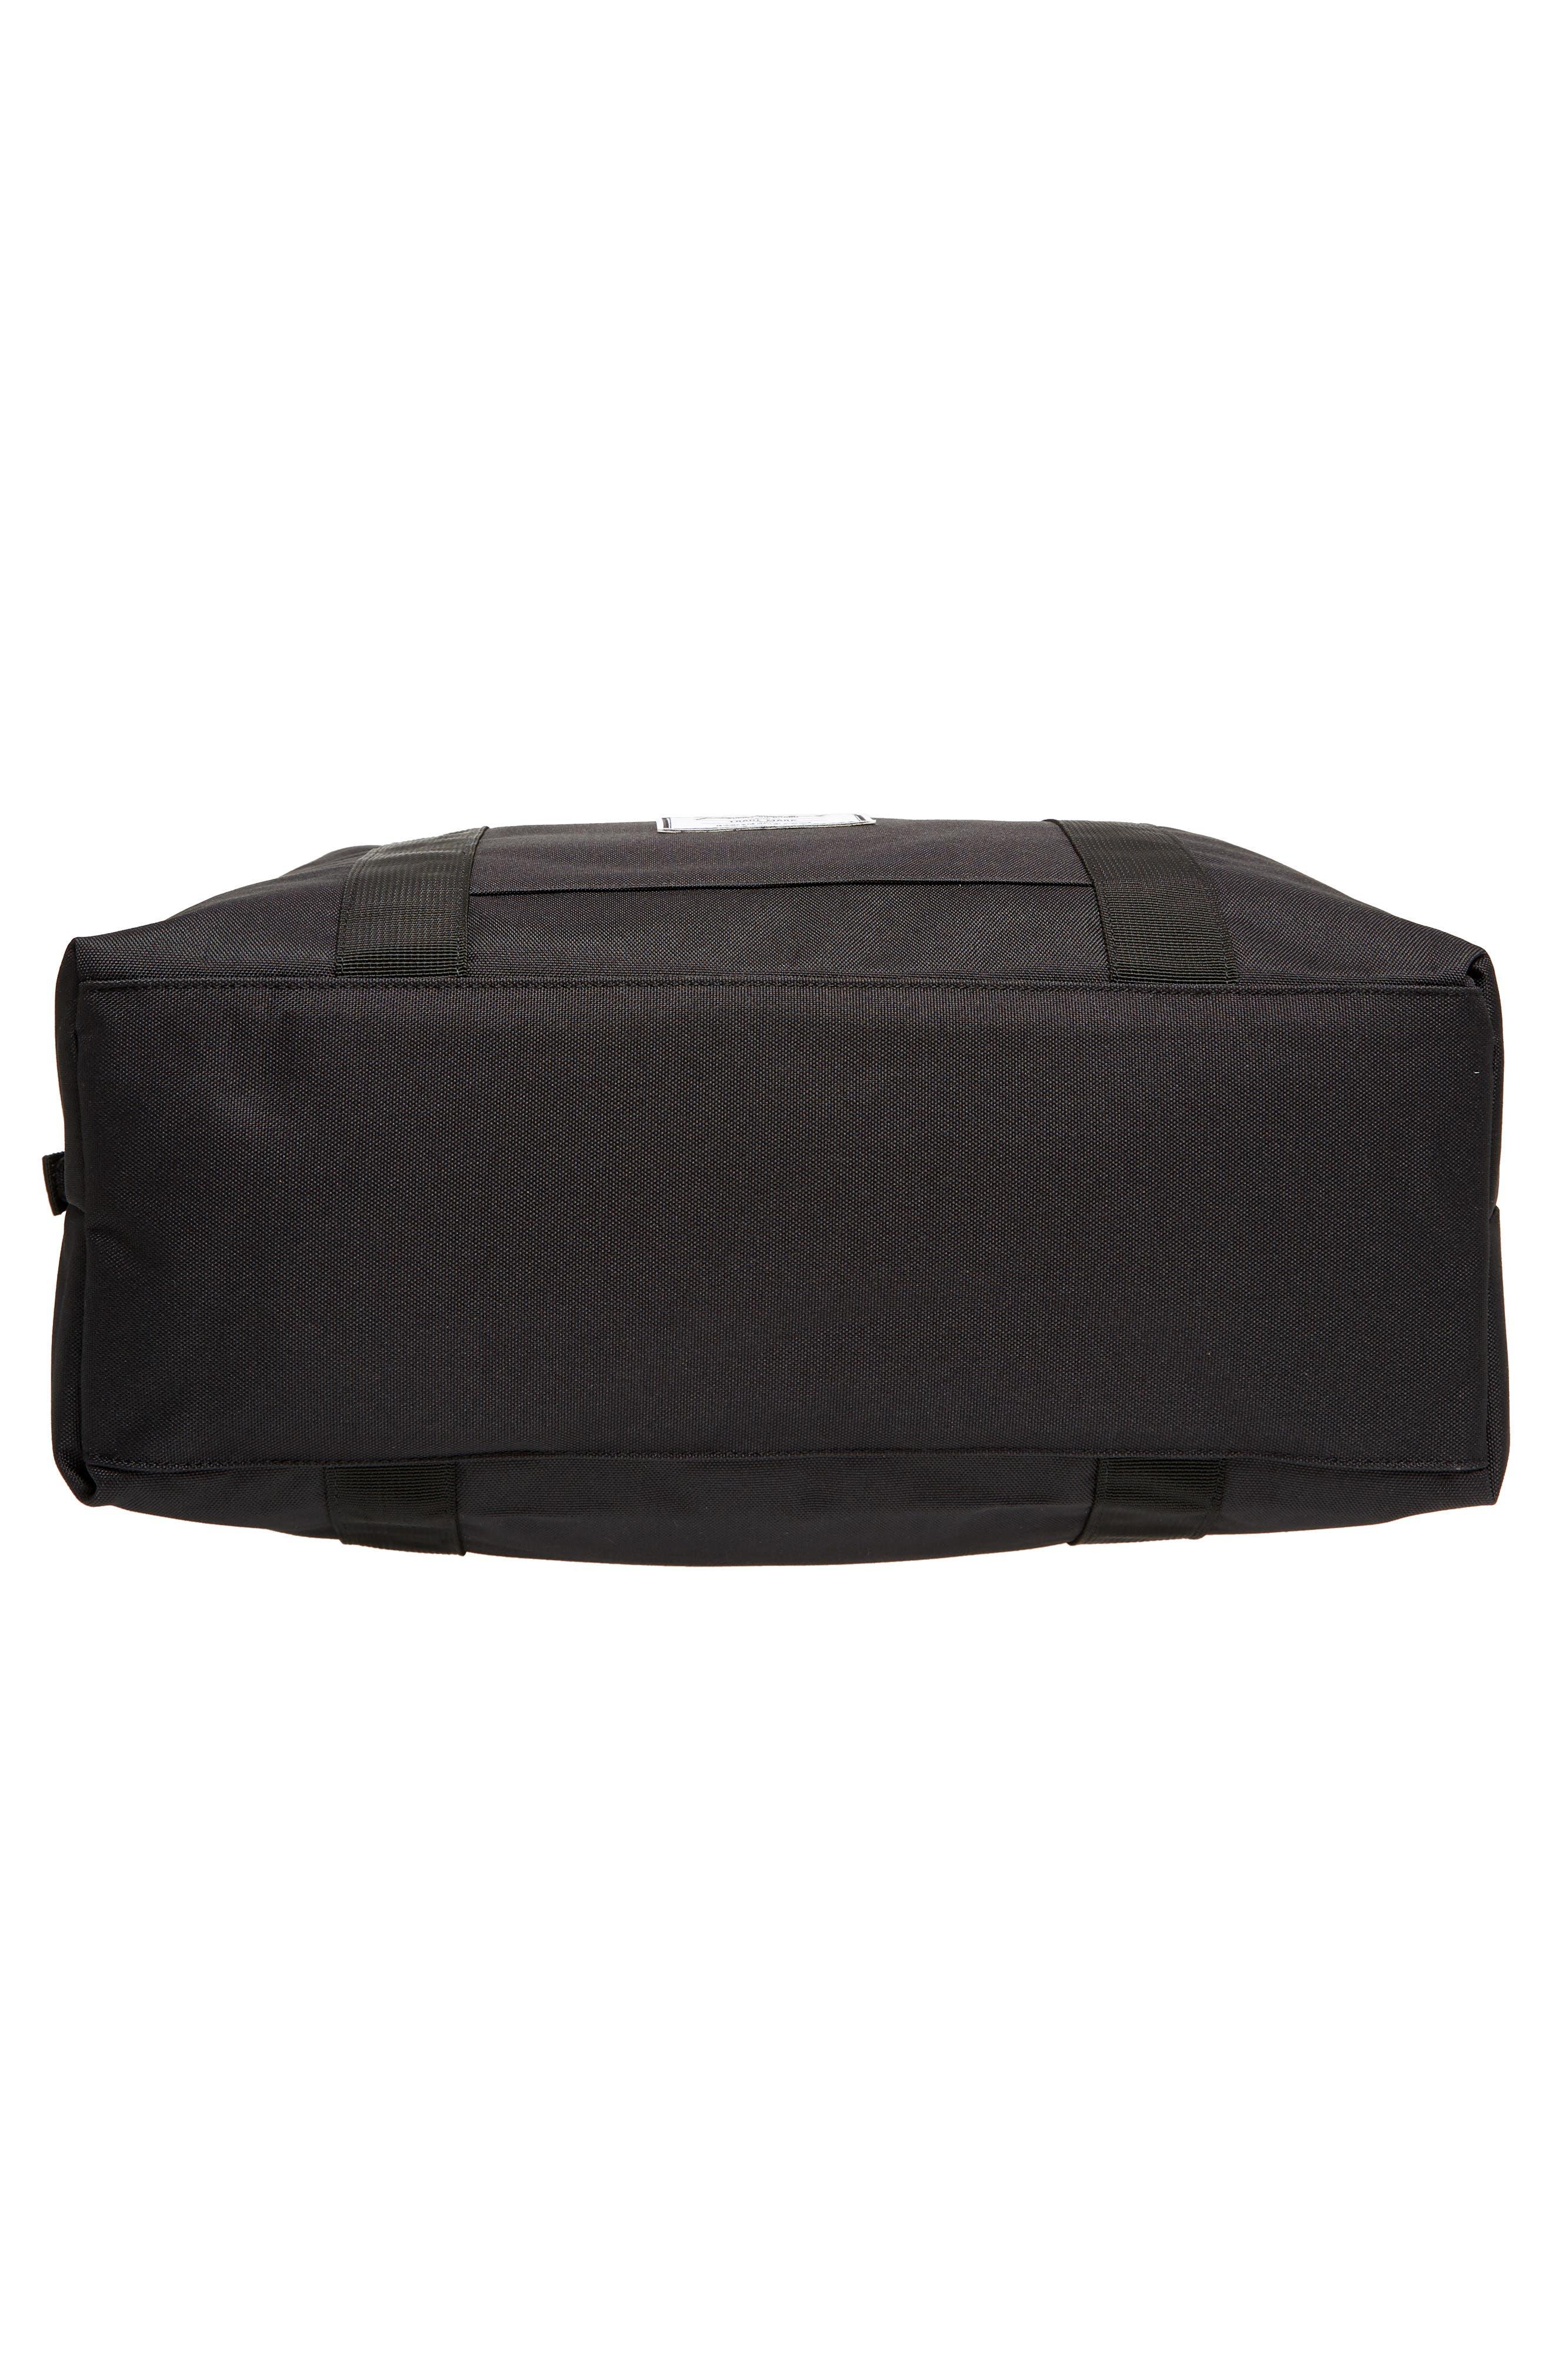 Strand Duffel Bag,                             Alternate thumbnail 6, color,                             Black